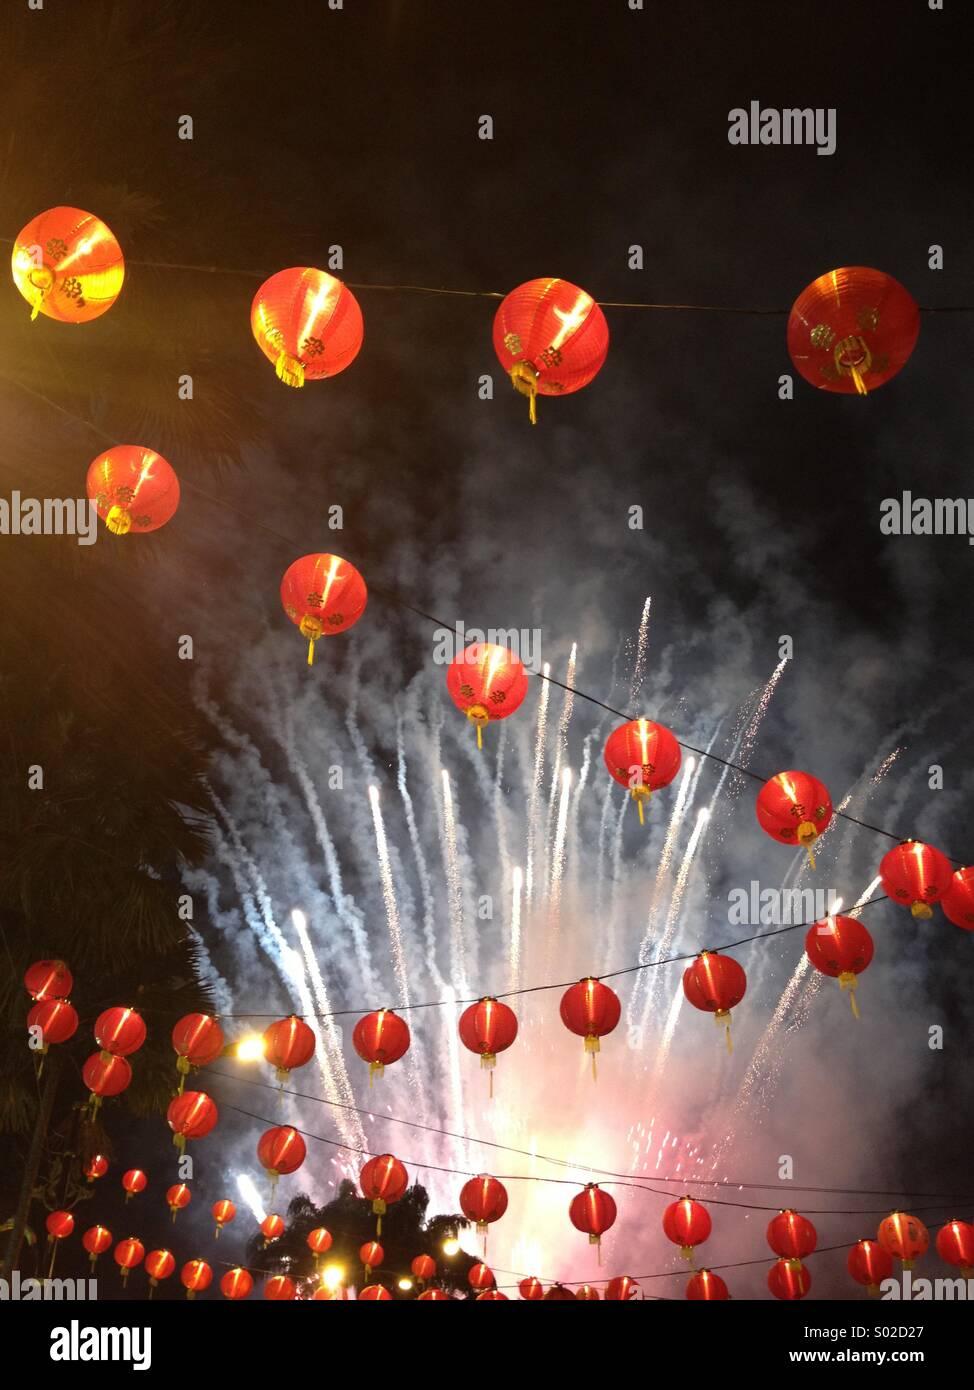 Chinese New Year lanterns fireworks - Stock Image